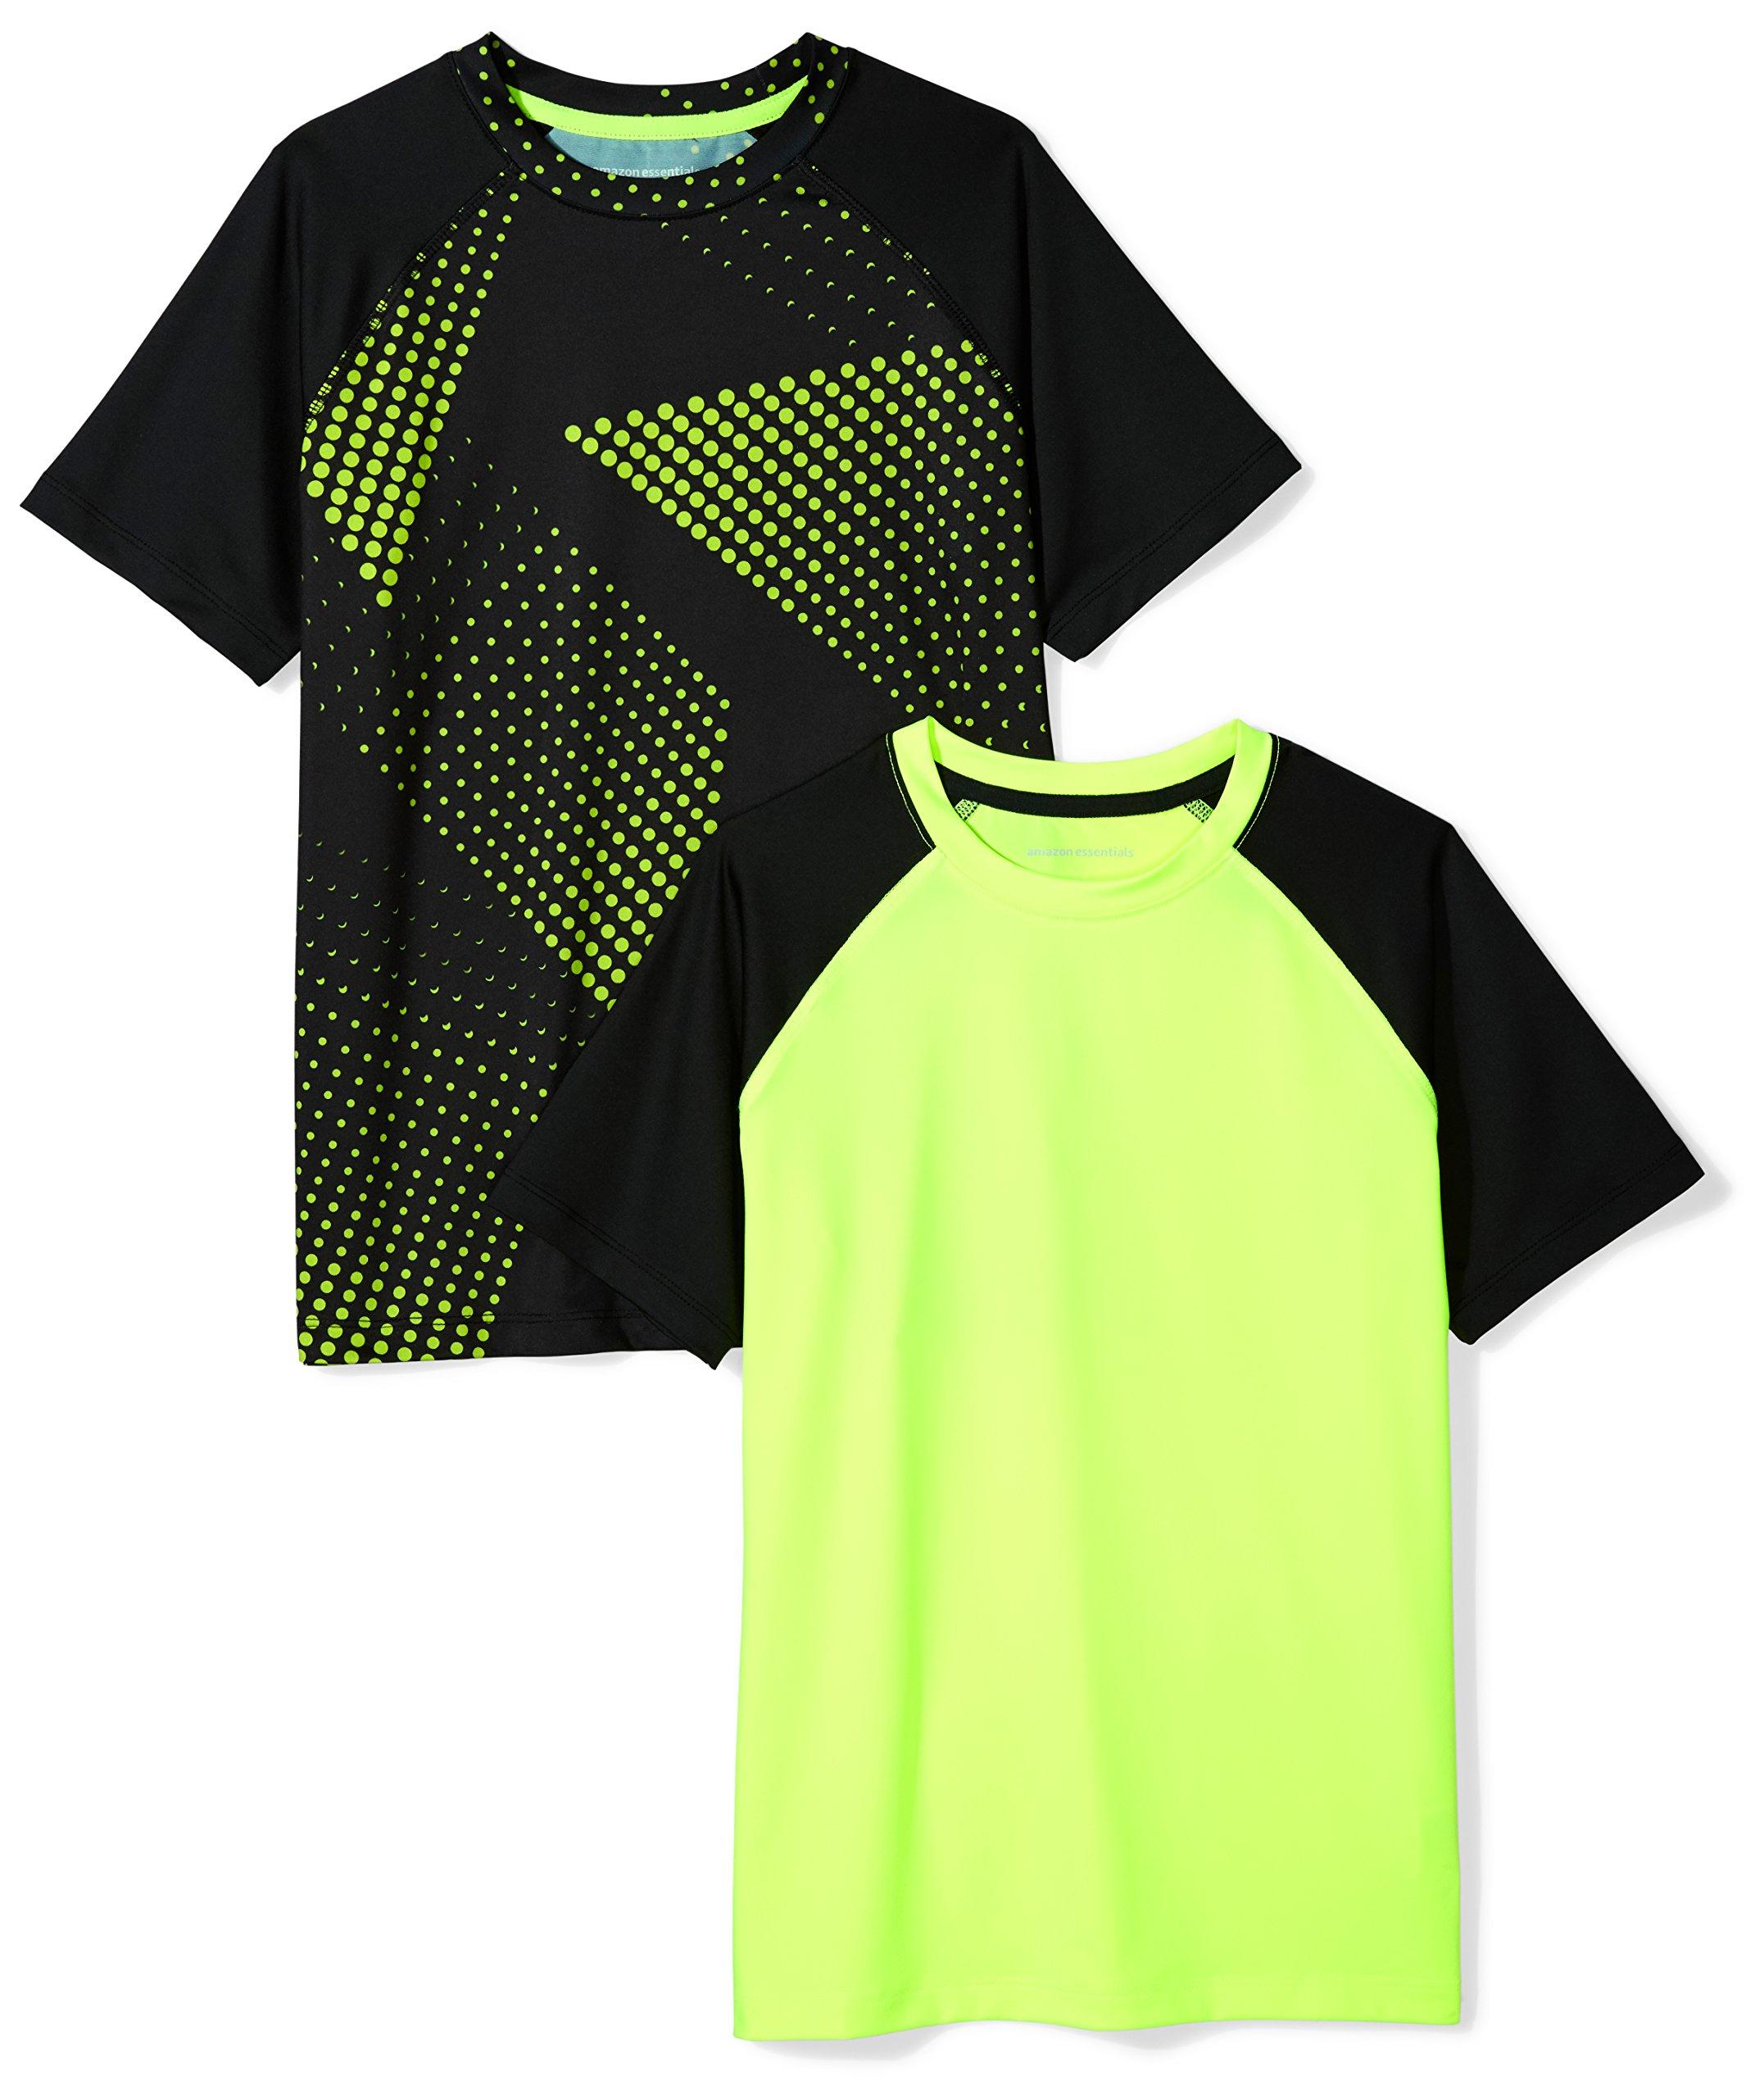 Amazon Essentials Boys' 2-Pack Short-Sleeve Raglan Active Tee, Gradient Print, M